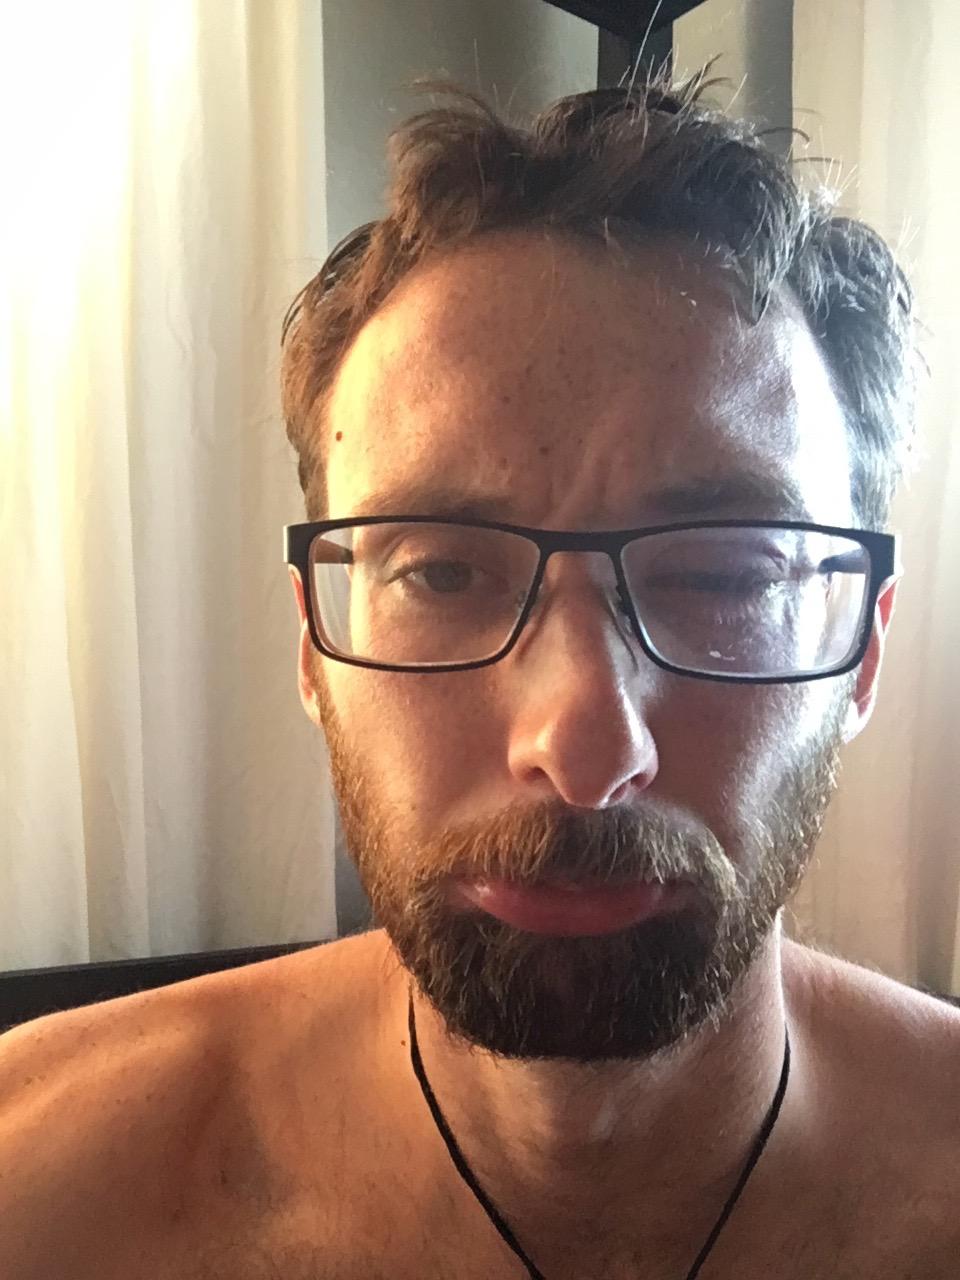 Day one - my eye fiasco